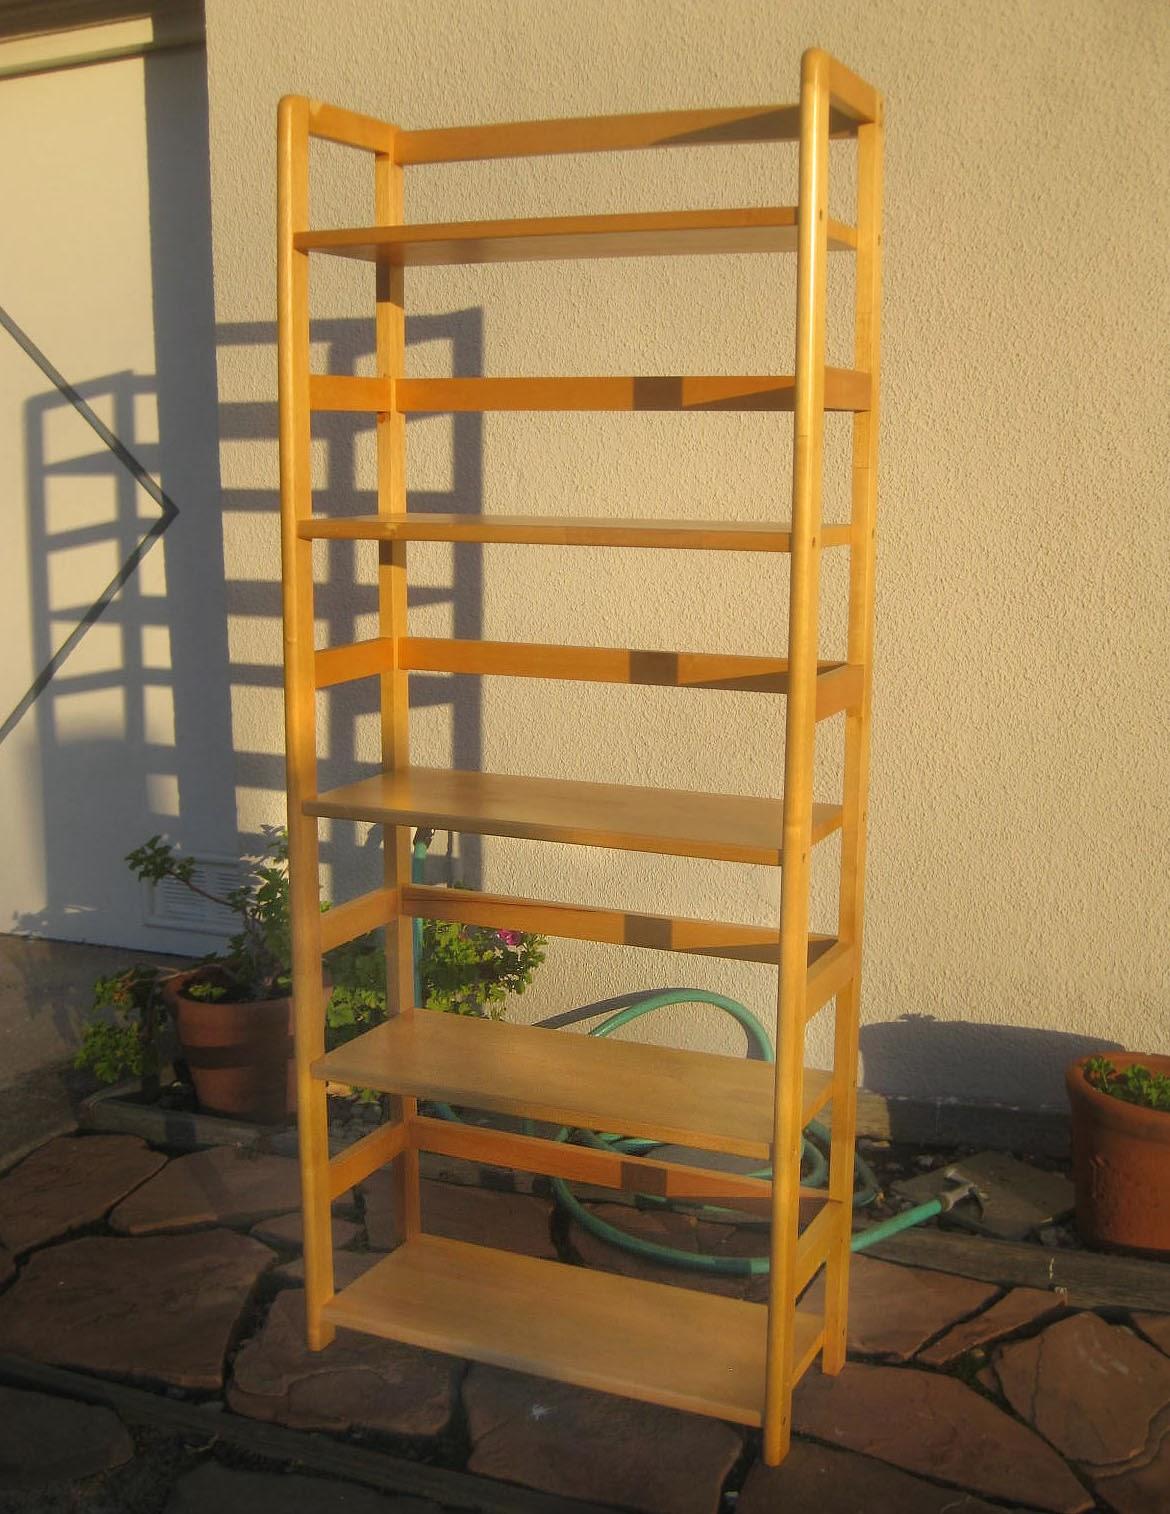 Backless bookshelf 28 images genuine solid oak 8ft for Ikea backless bookcase